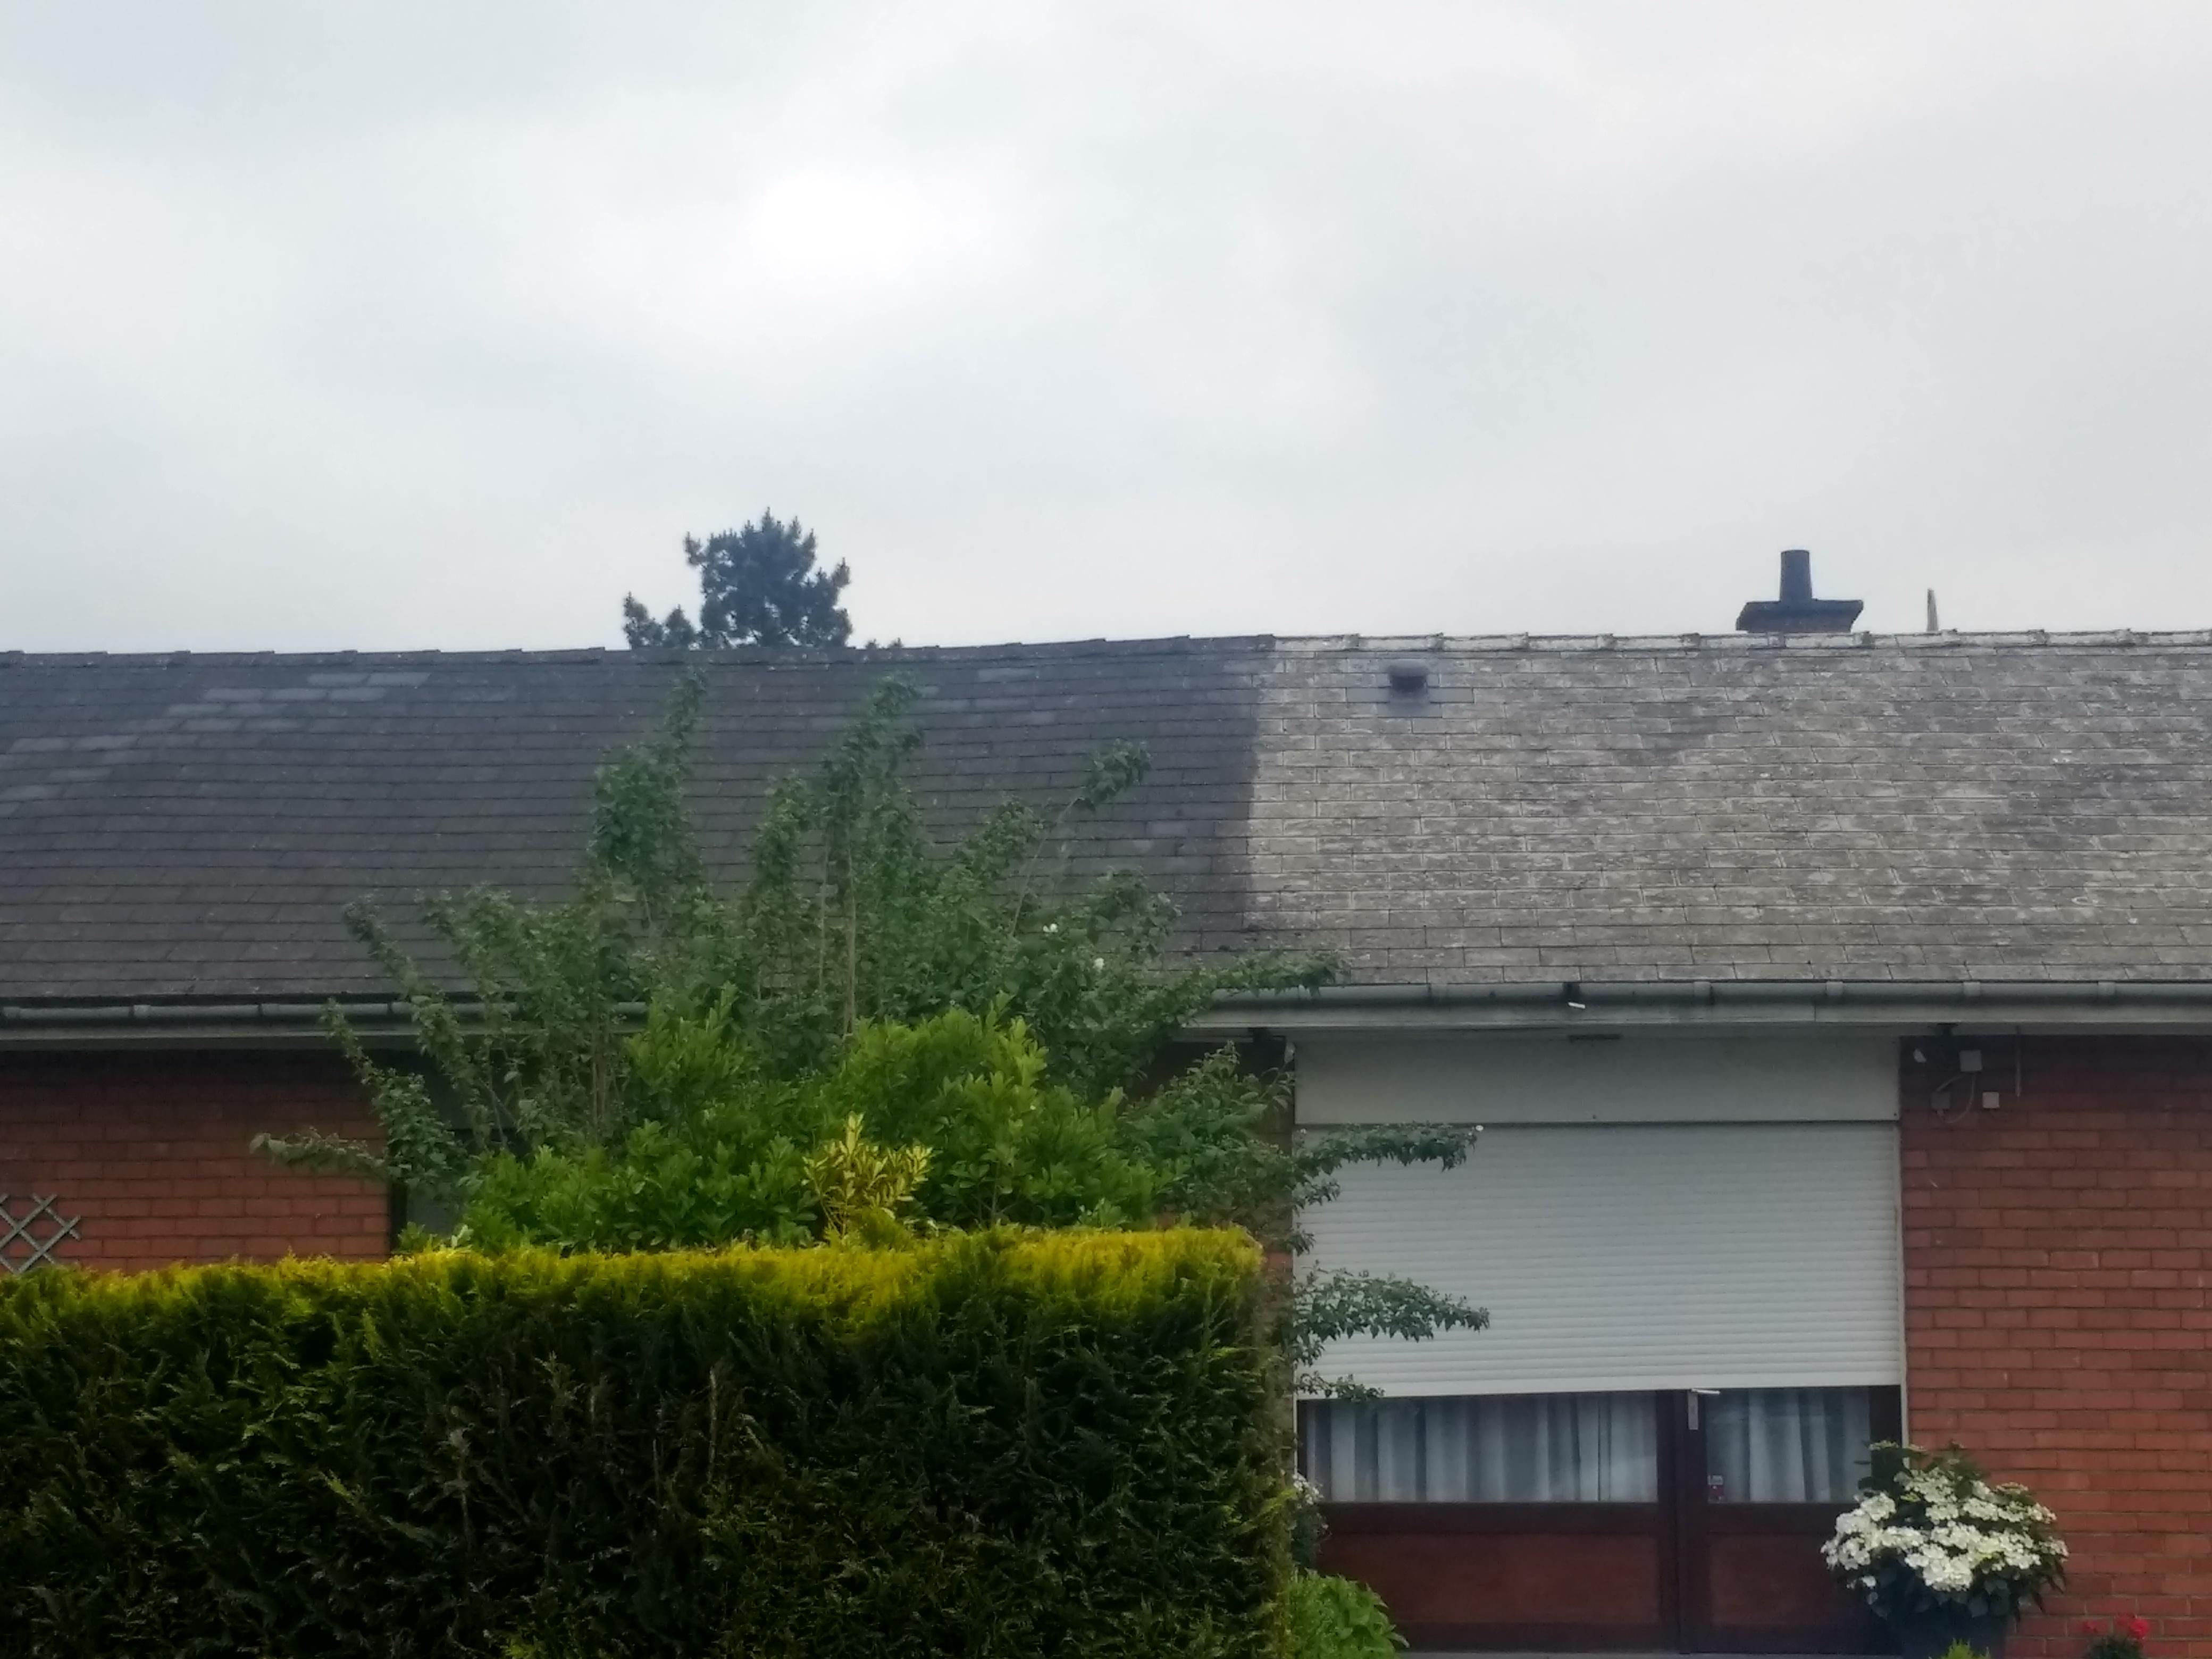 nettoyer le toit de sa maison cool nettoyer le toit de sa maison affordable with nettoyer le. Black Bedroom Furniture Sets. Home Design Ideas